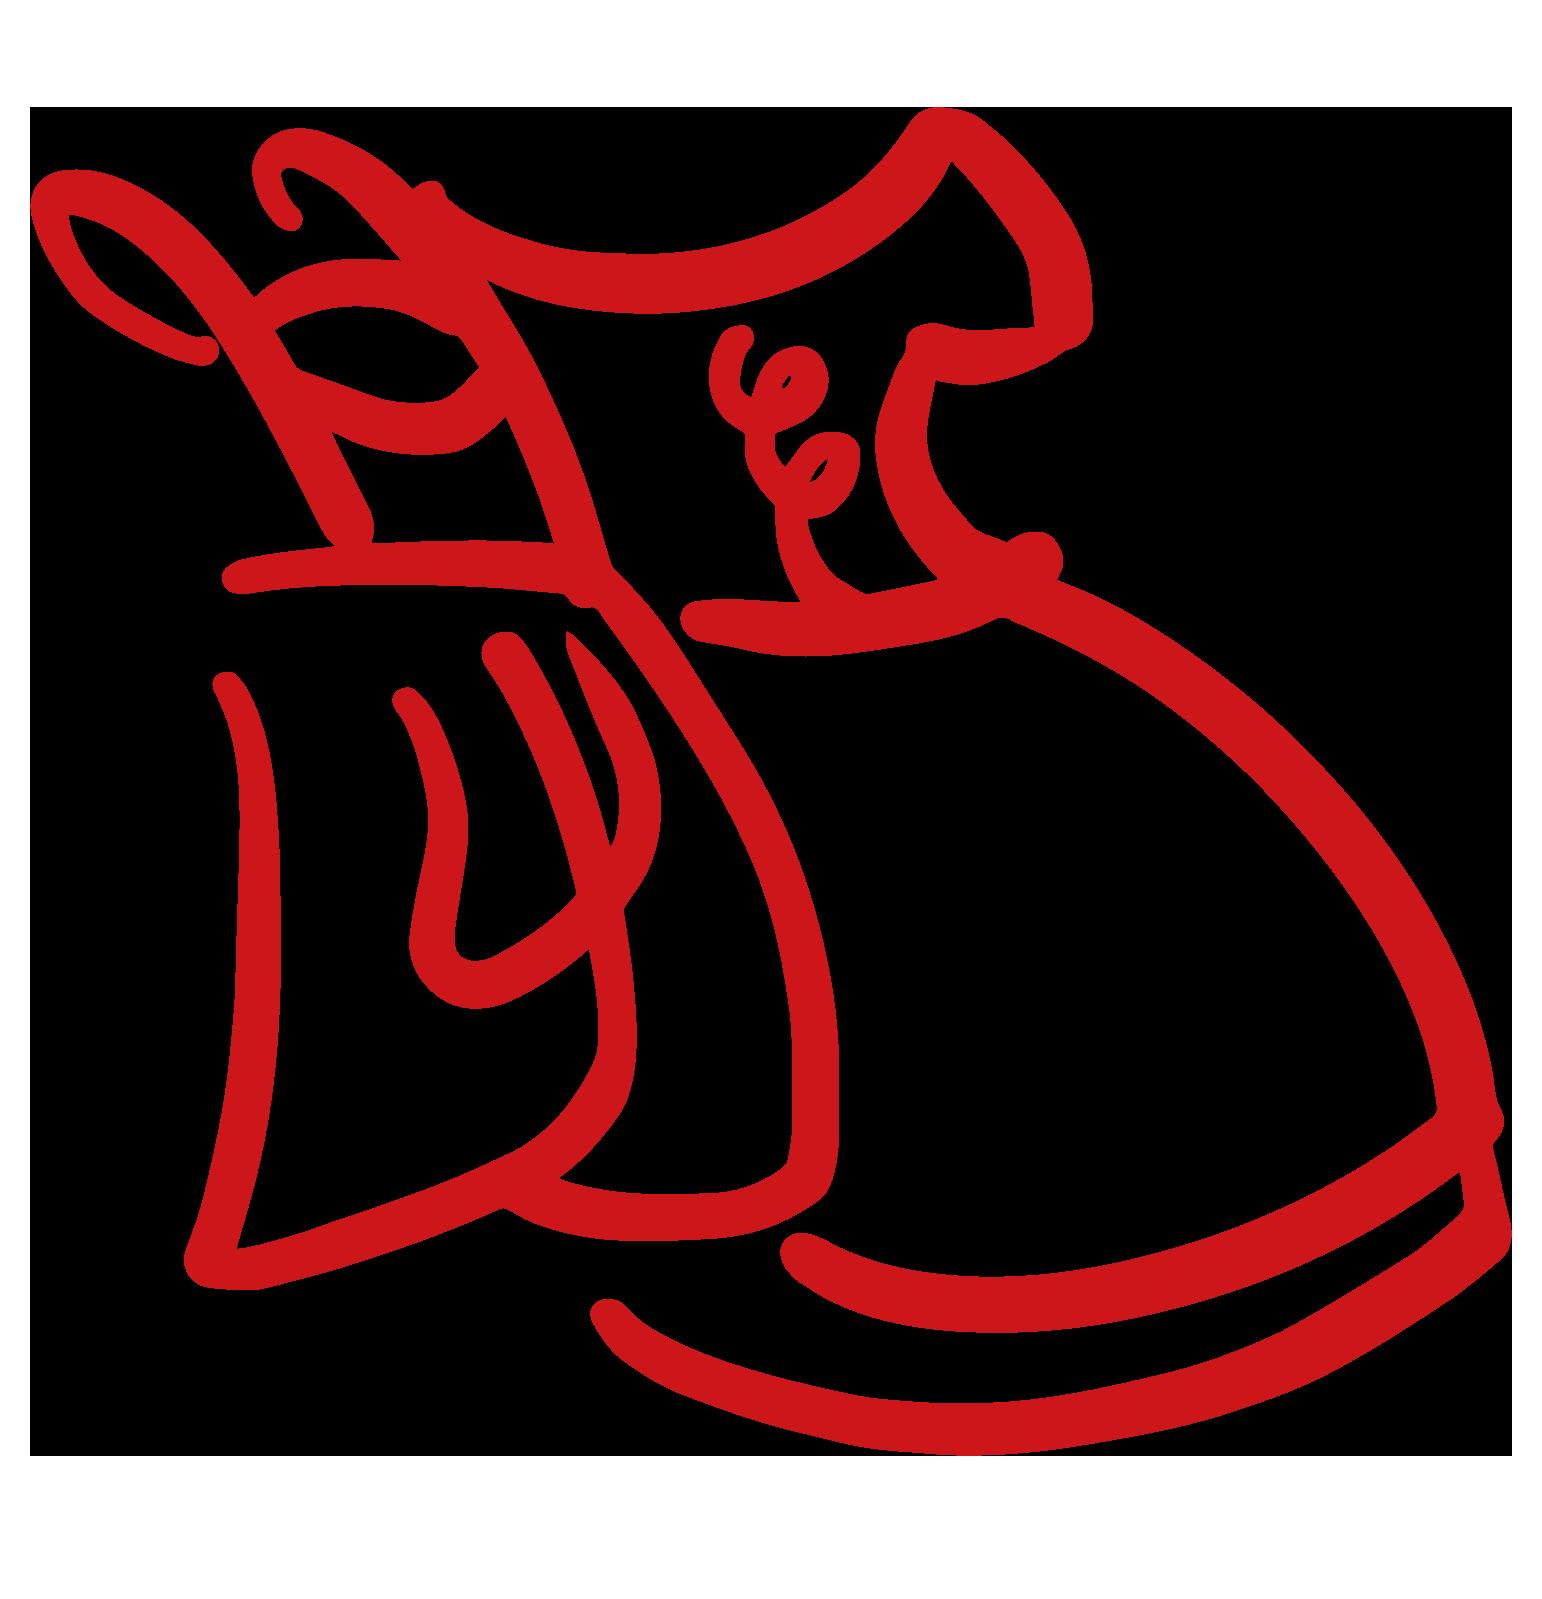 NEU! Trachtenhemd, blau-Karo